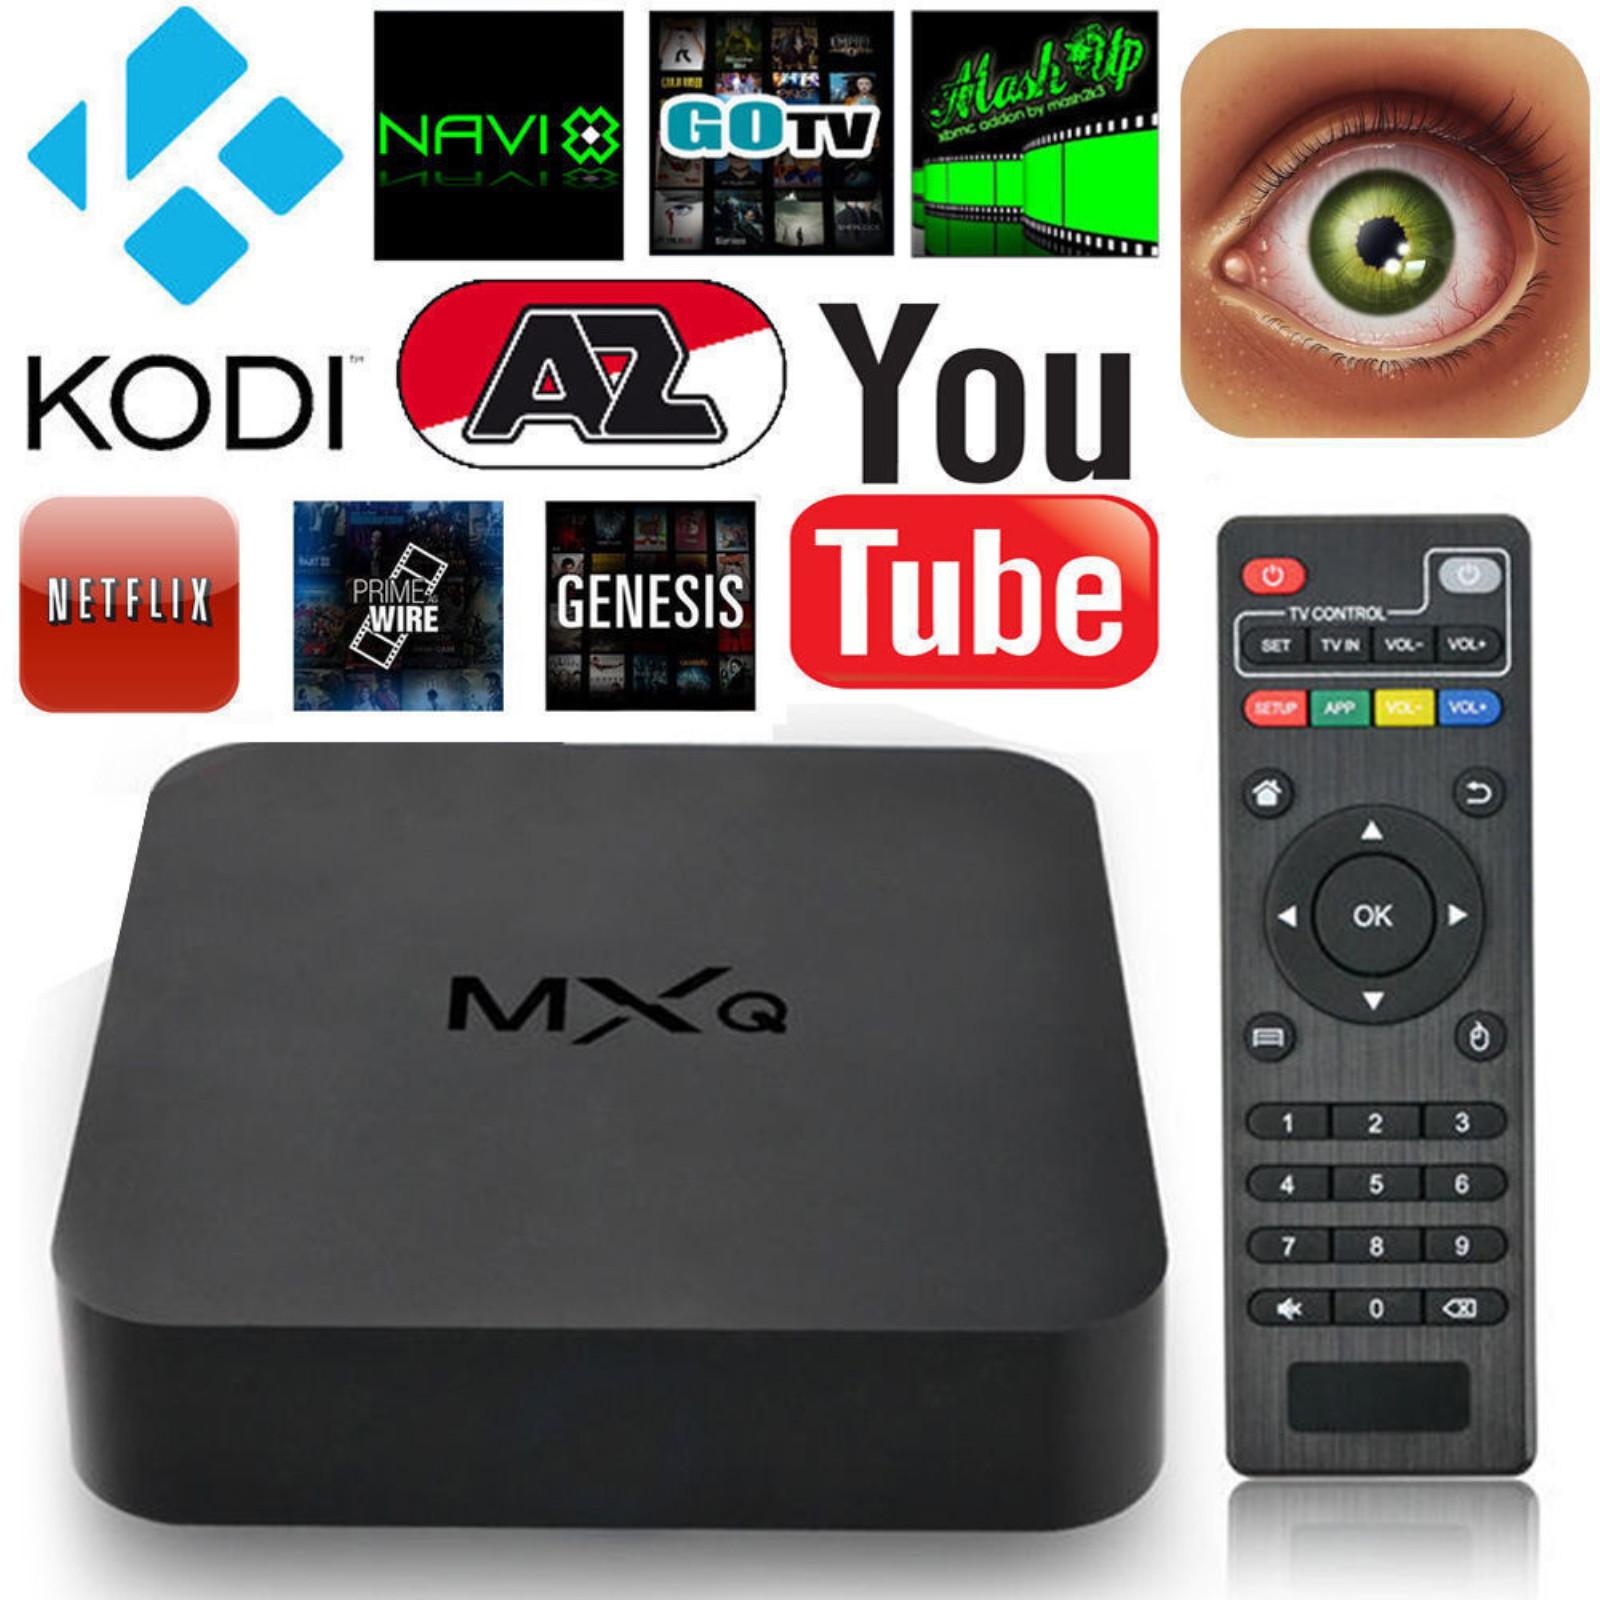 Android Tv Box Vergleich